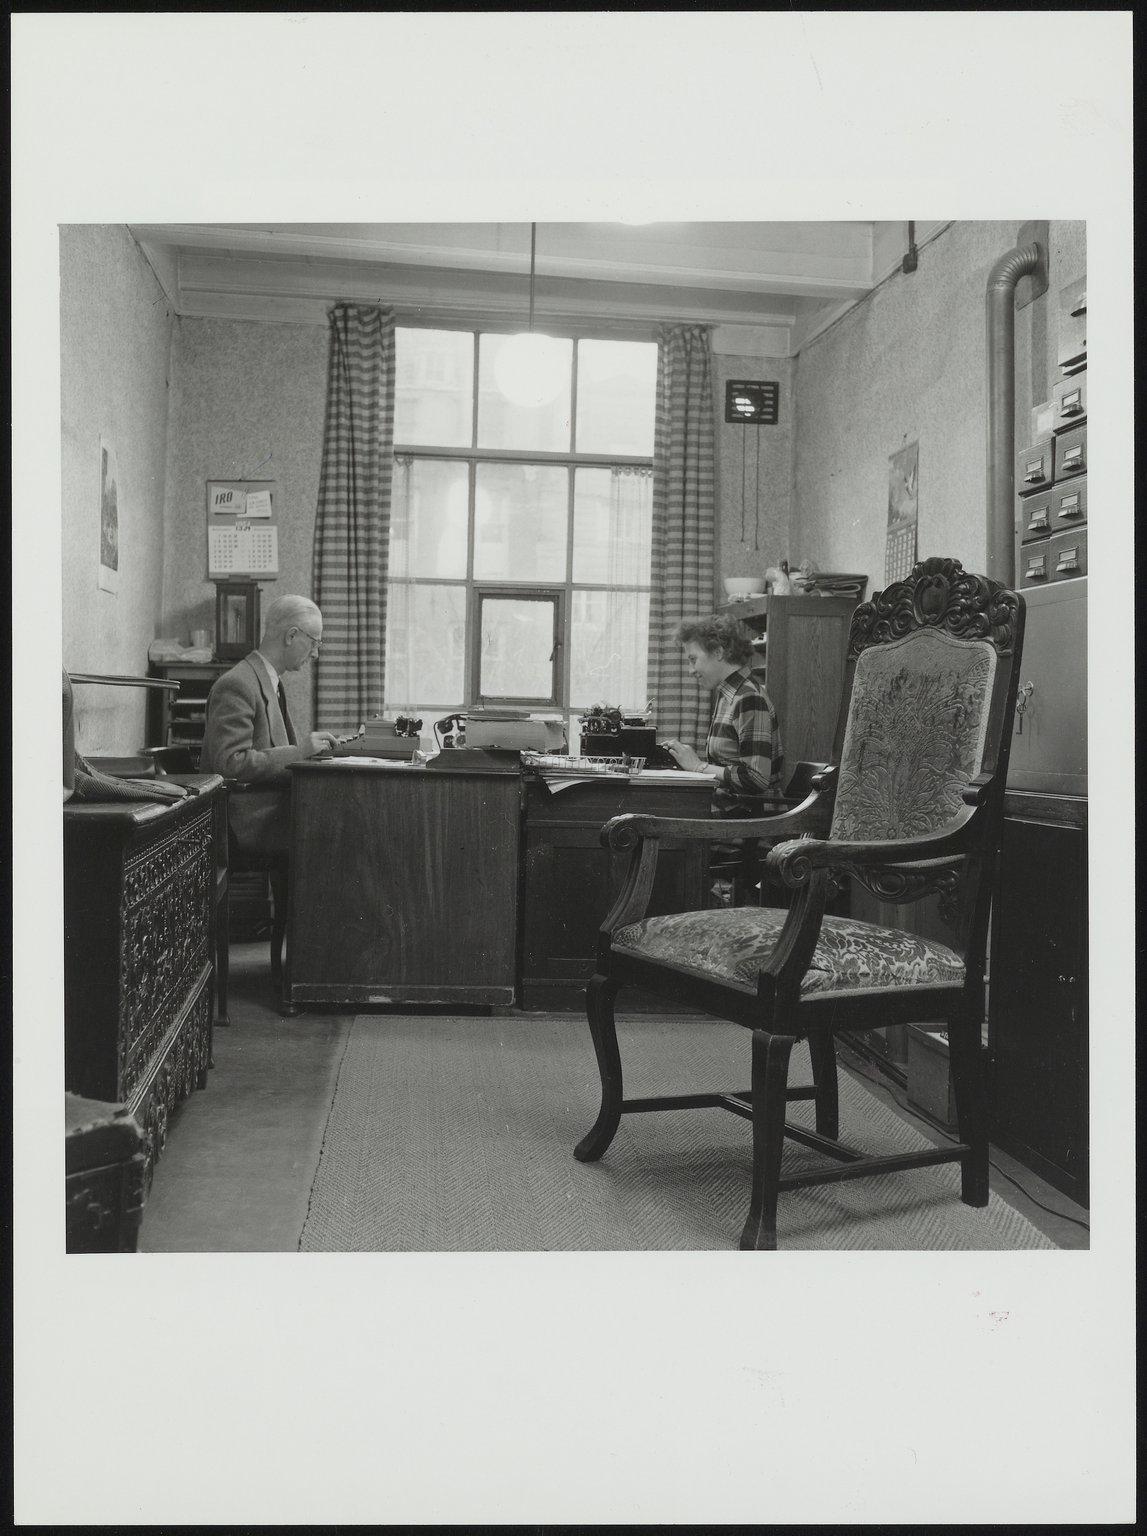 Johannes Kleiman en secretaresse Jeanne Kwakernaak in het privé-kantoor (1954).